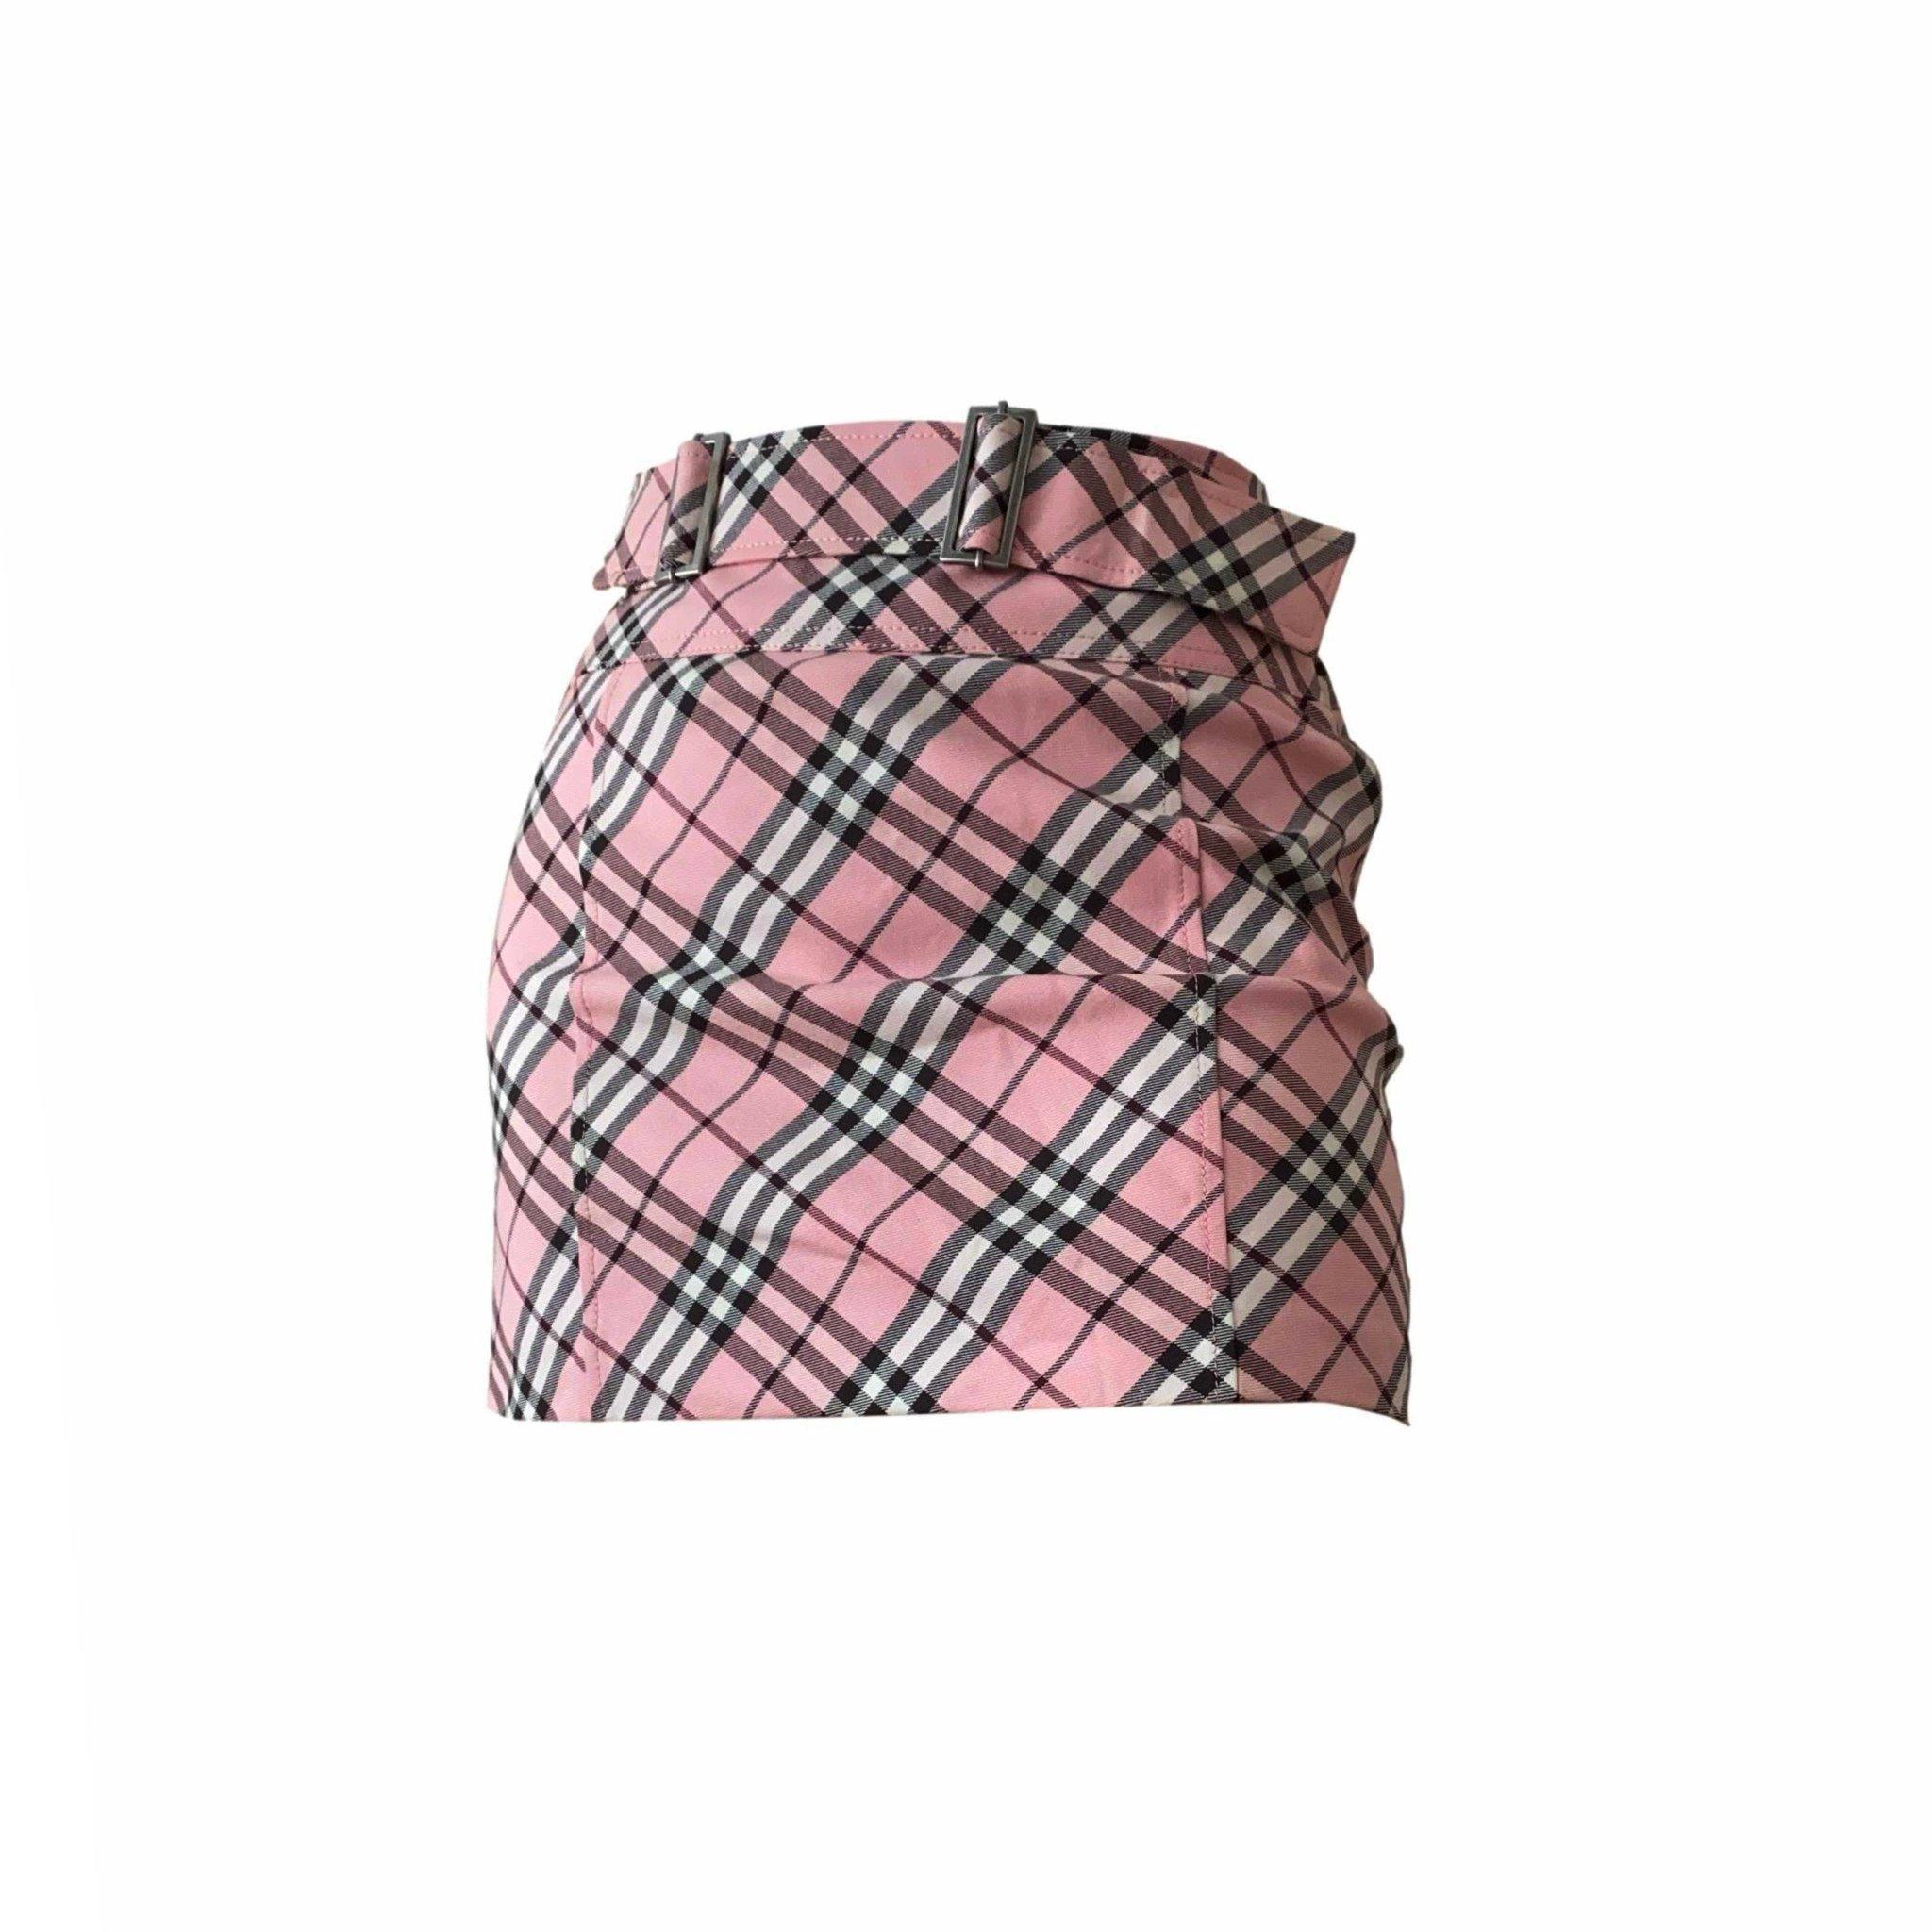 Classic Pink Plaid Skirt by Burberry, available on treasuresofnewyorkcity.com for $310 Bella Hadid Skirt Exact Product